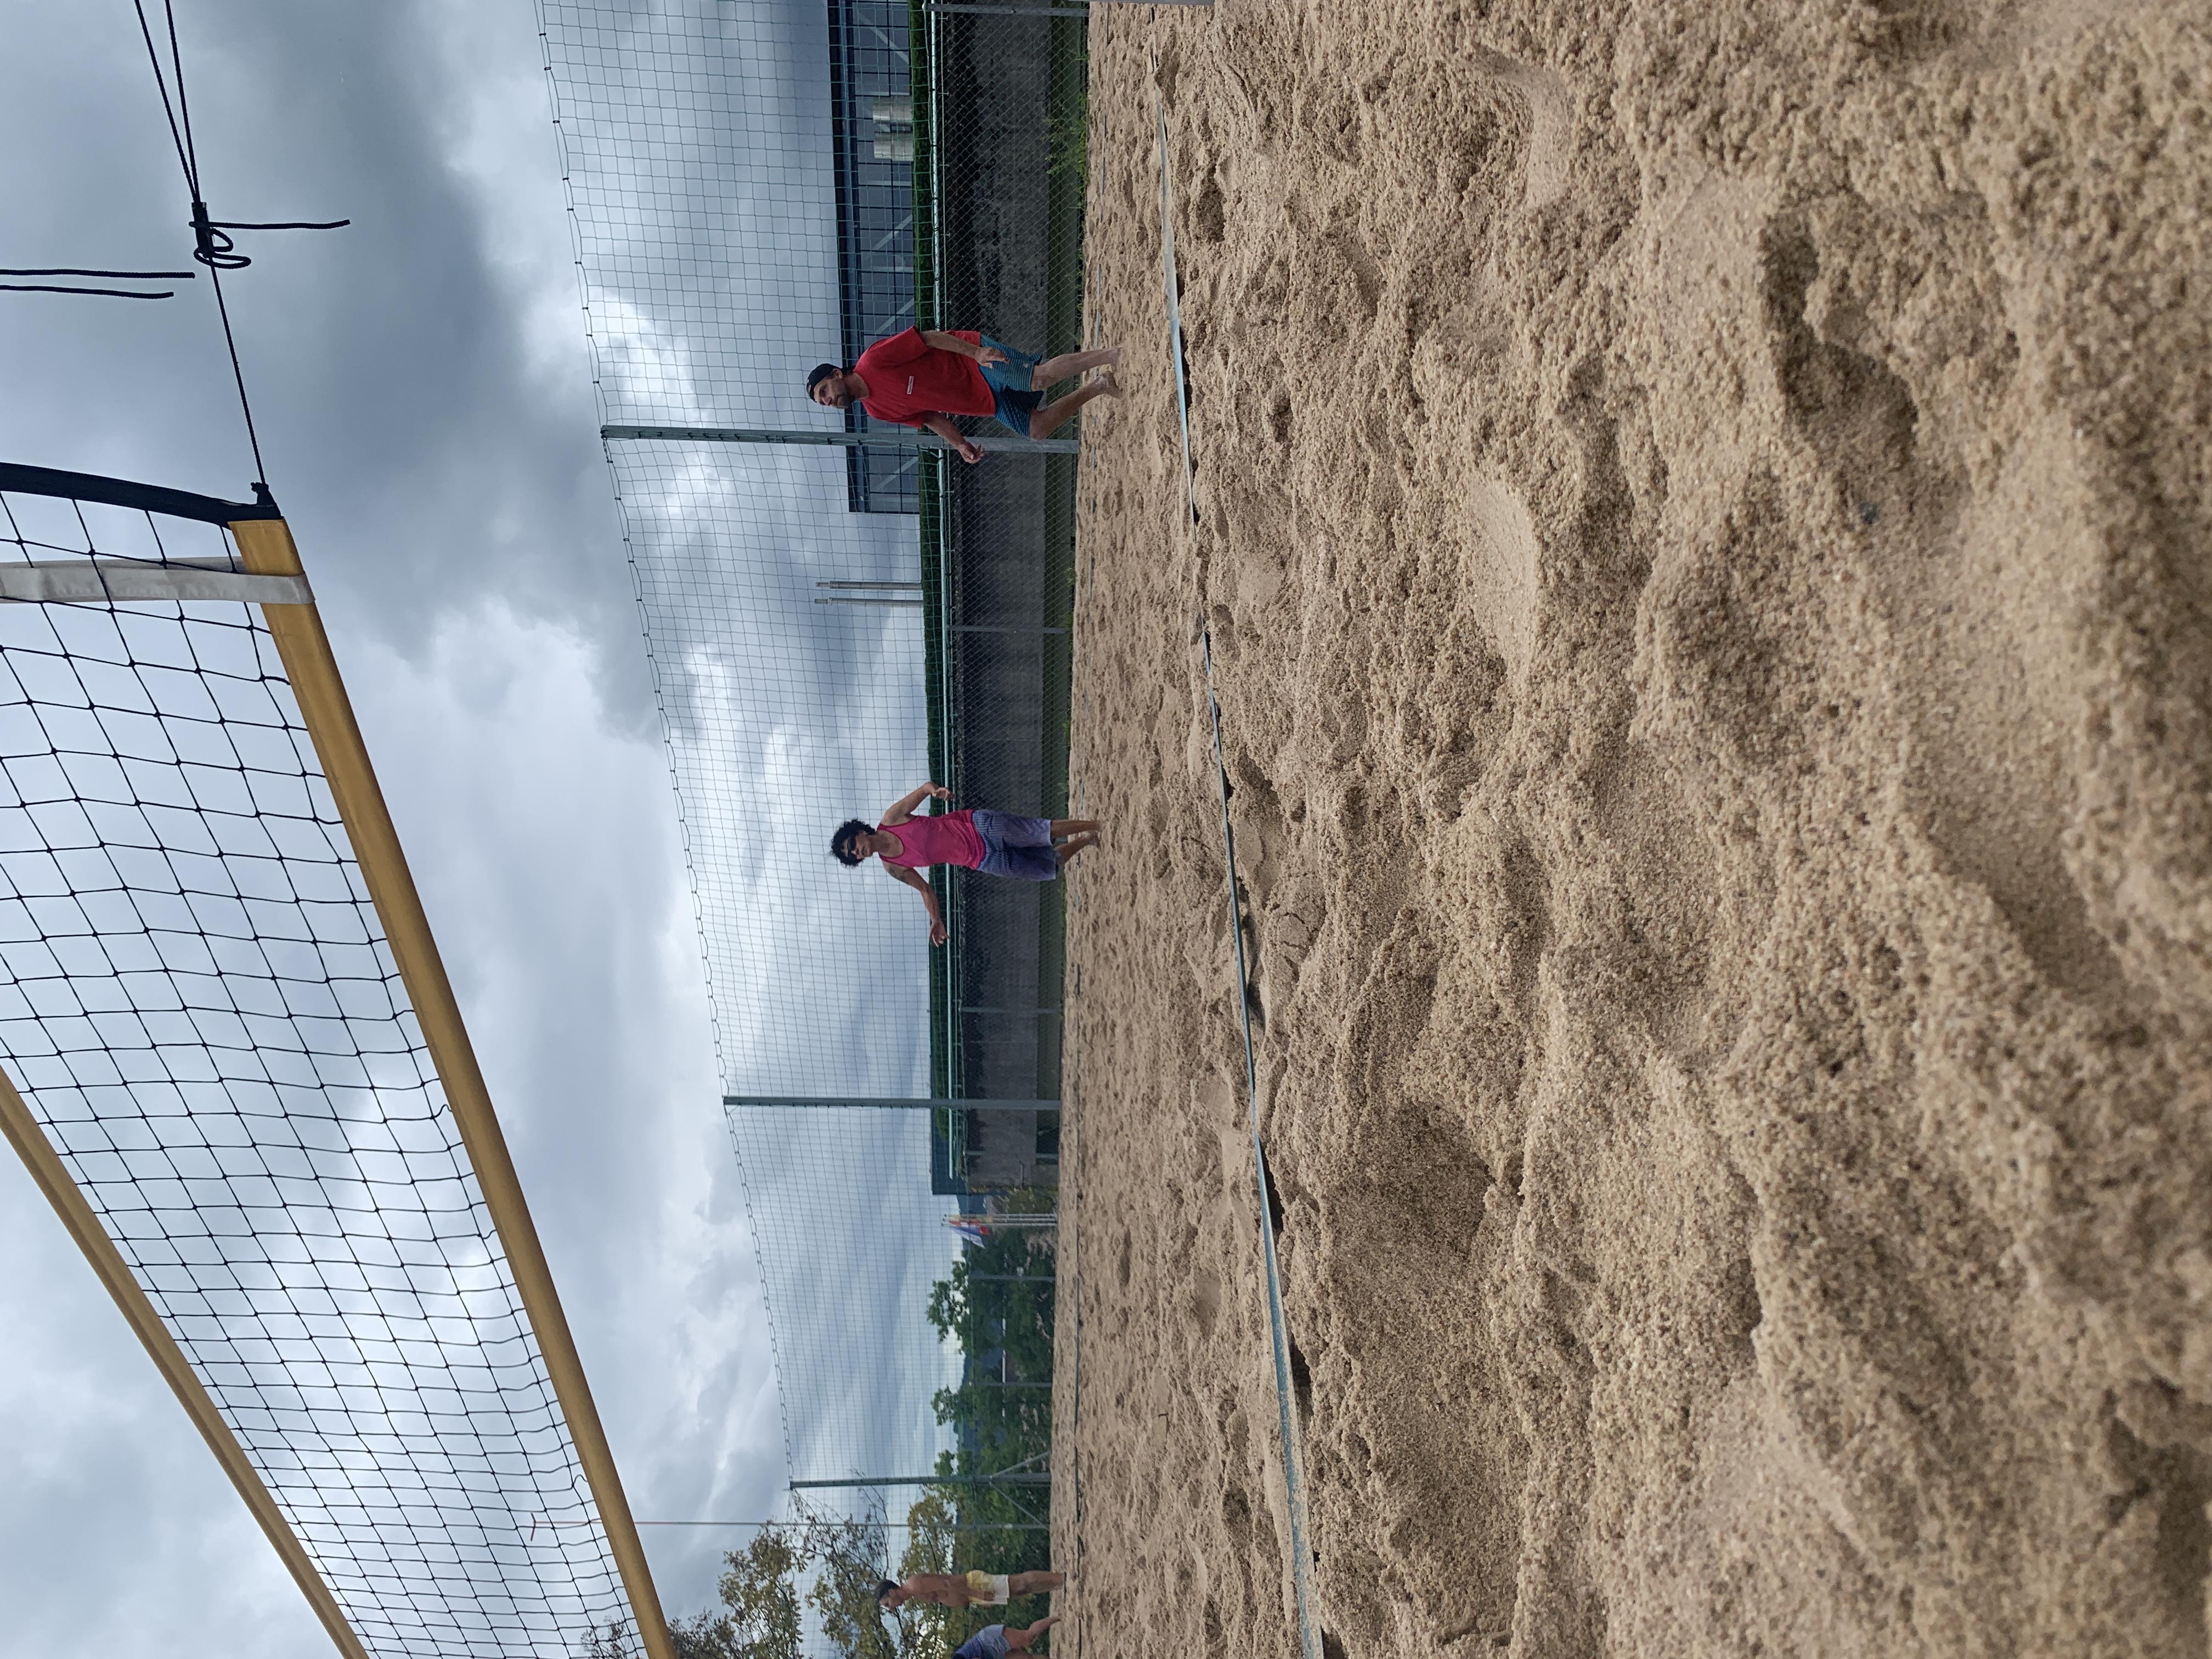 Beachvolleyball Turnier 2020